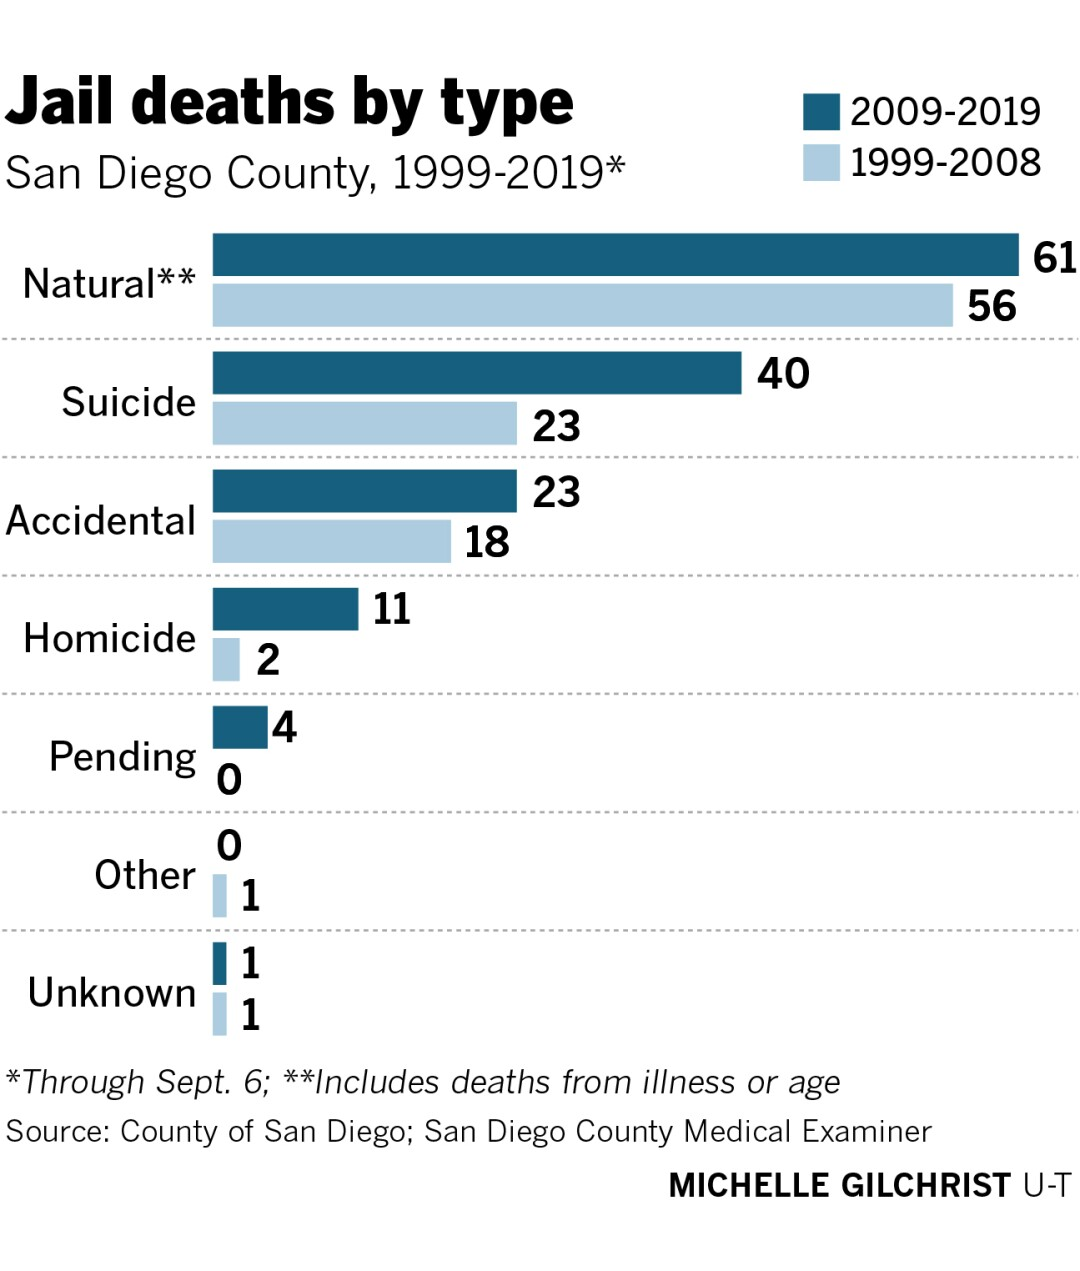 465930-w2-sd-id-g-jail-deaths-by-type.jpg